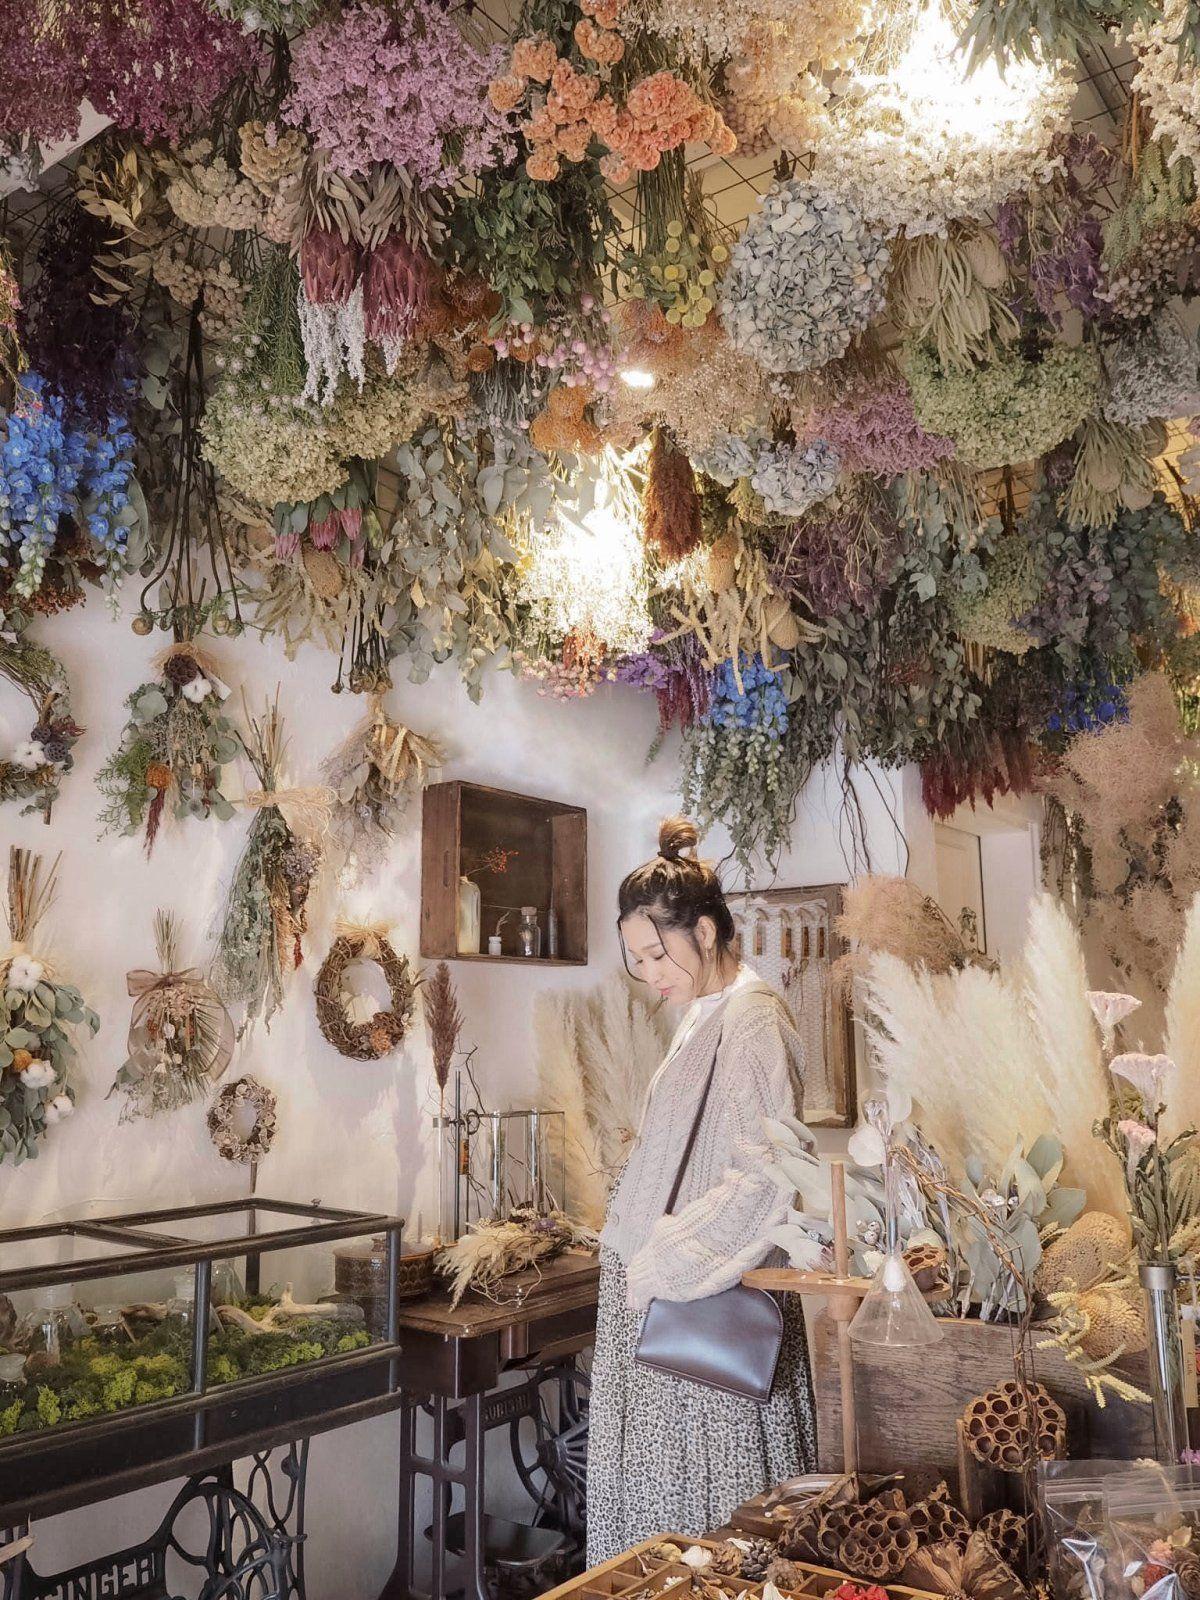 Cachette 北白川店/花に囲まれた空間でお茶を楽しめる隠れ家のようなカフェ